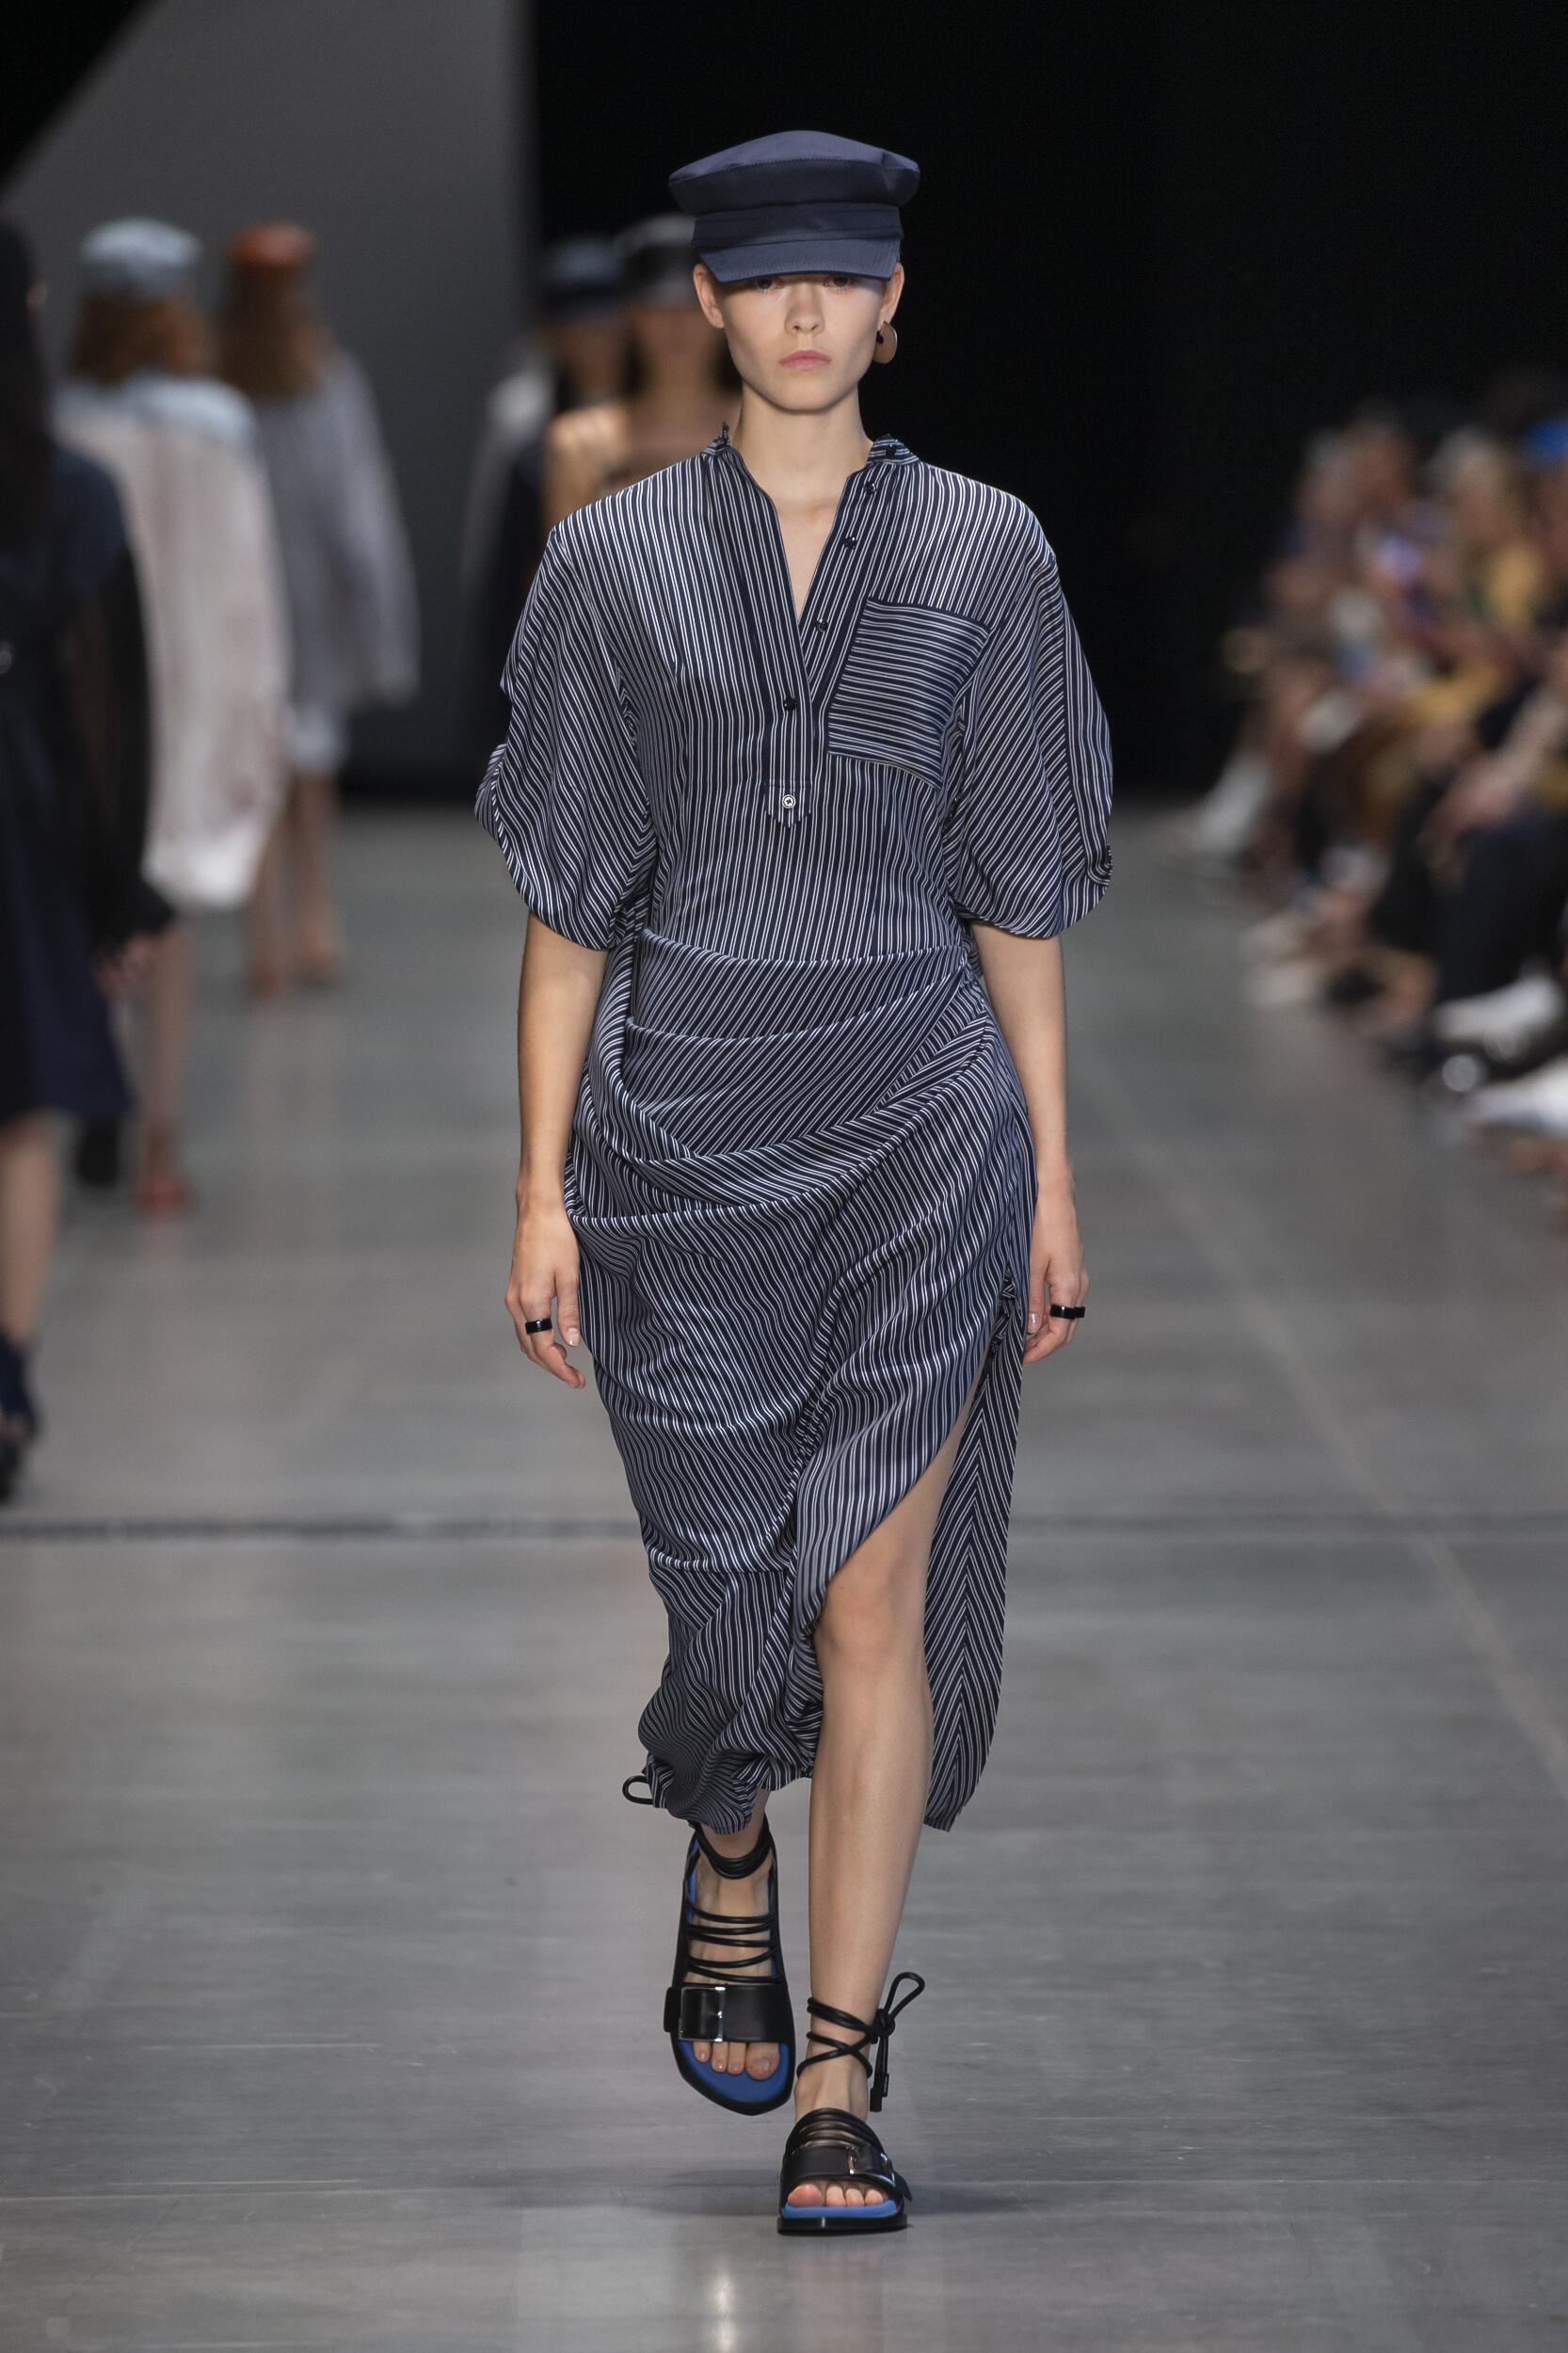 Fashion Model Woman Sportmax Catwalk